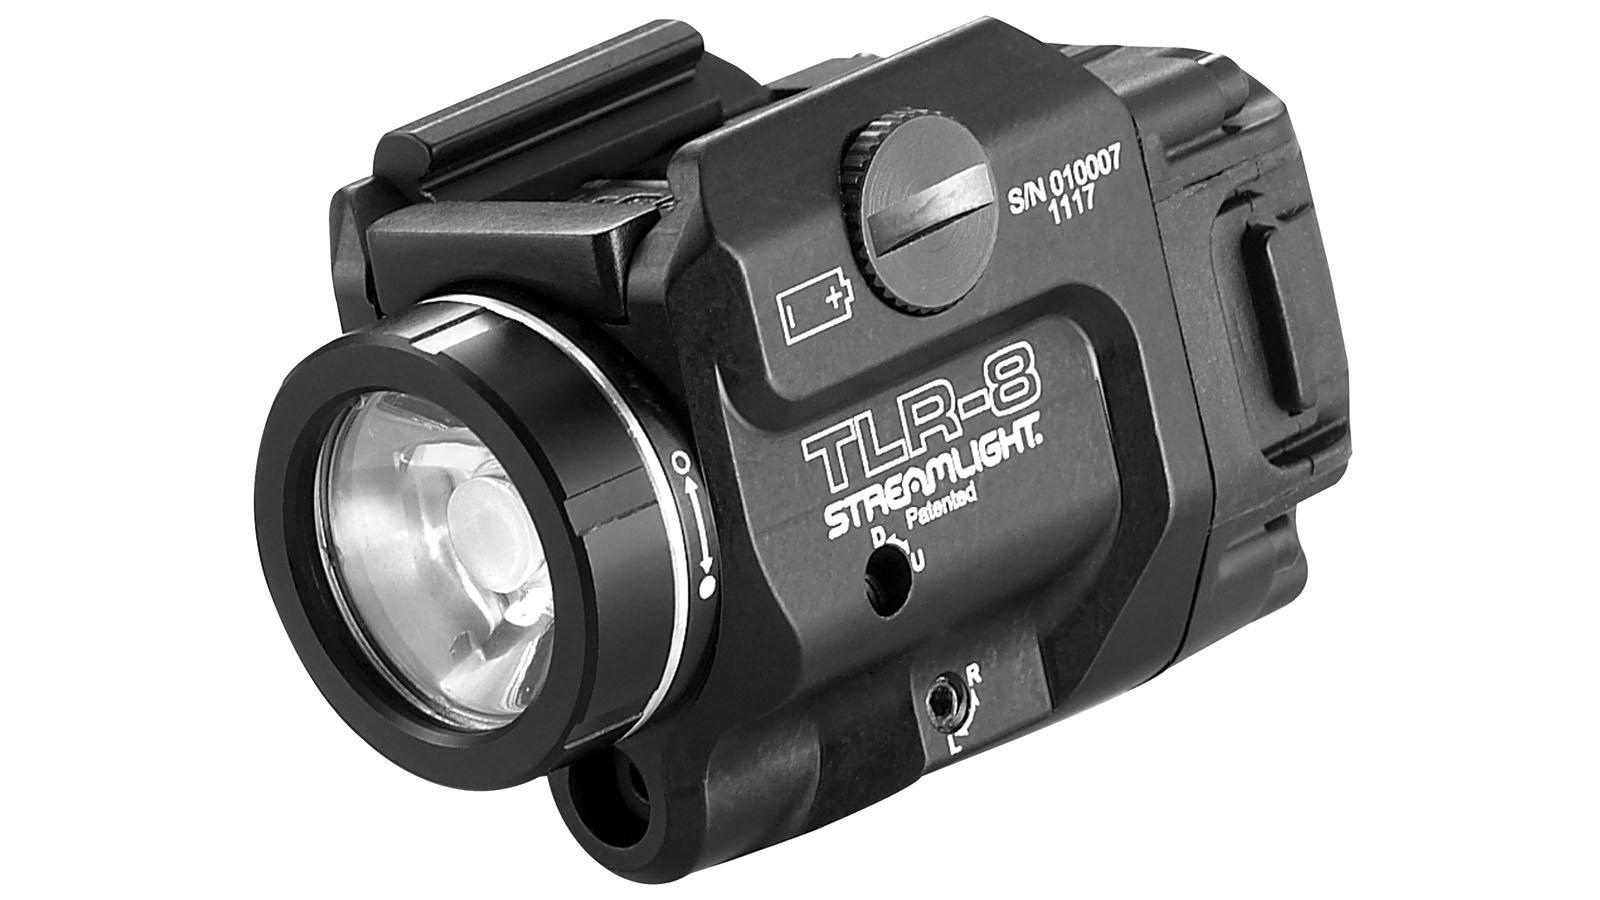 Streamlight TLR-8 Tactical Weapon Light/laser 500 Lumens Black Finish ''New Item''